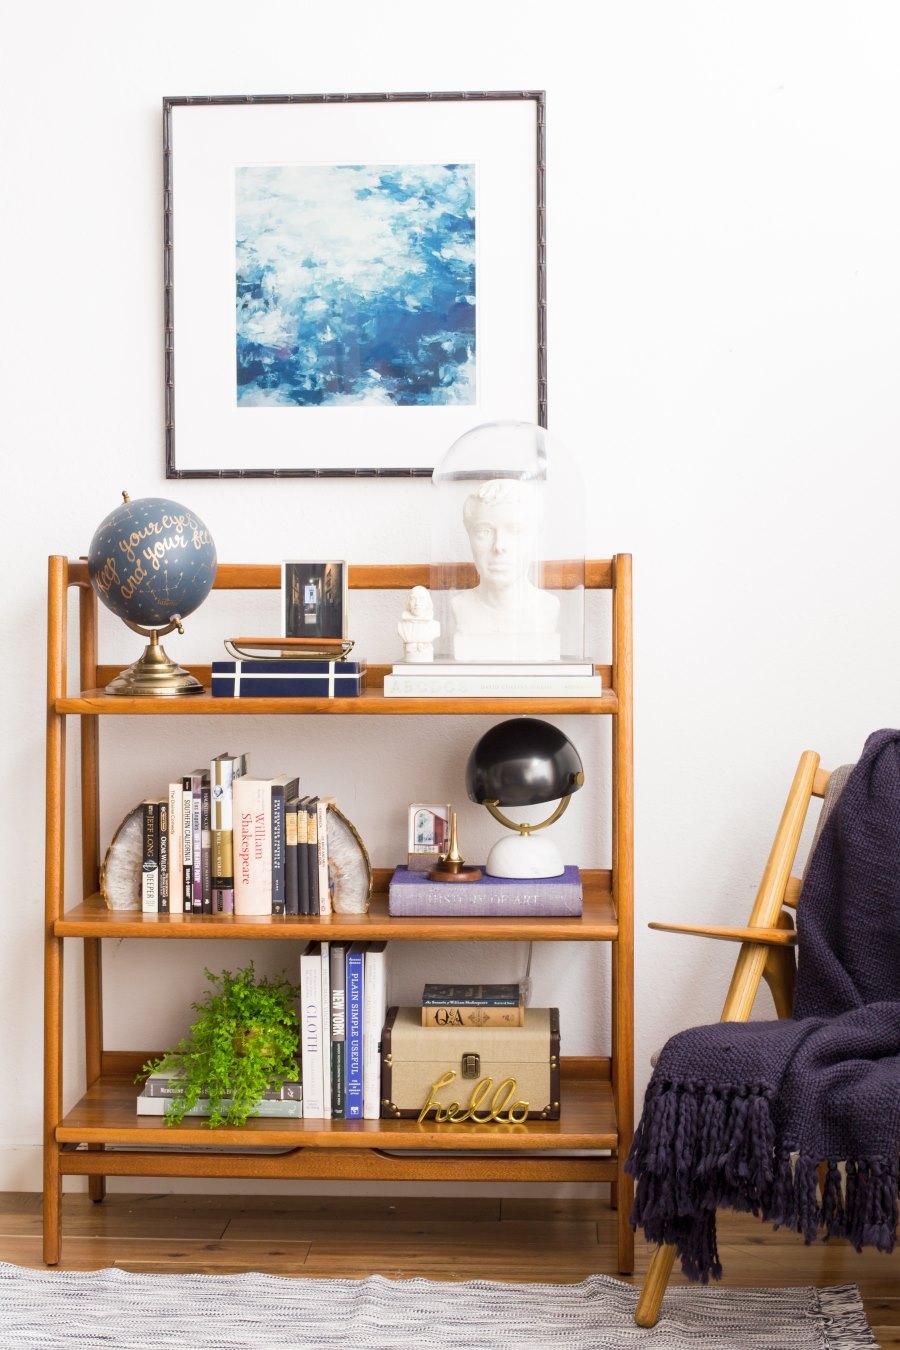 Bookshelf with academic style